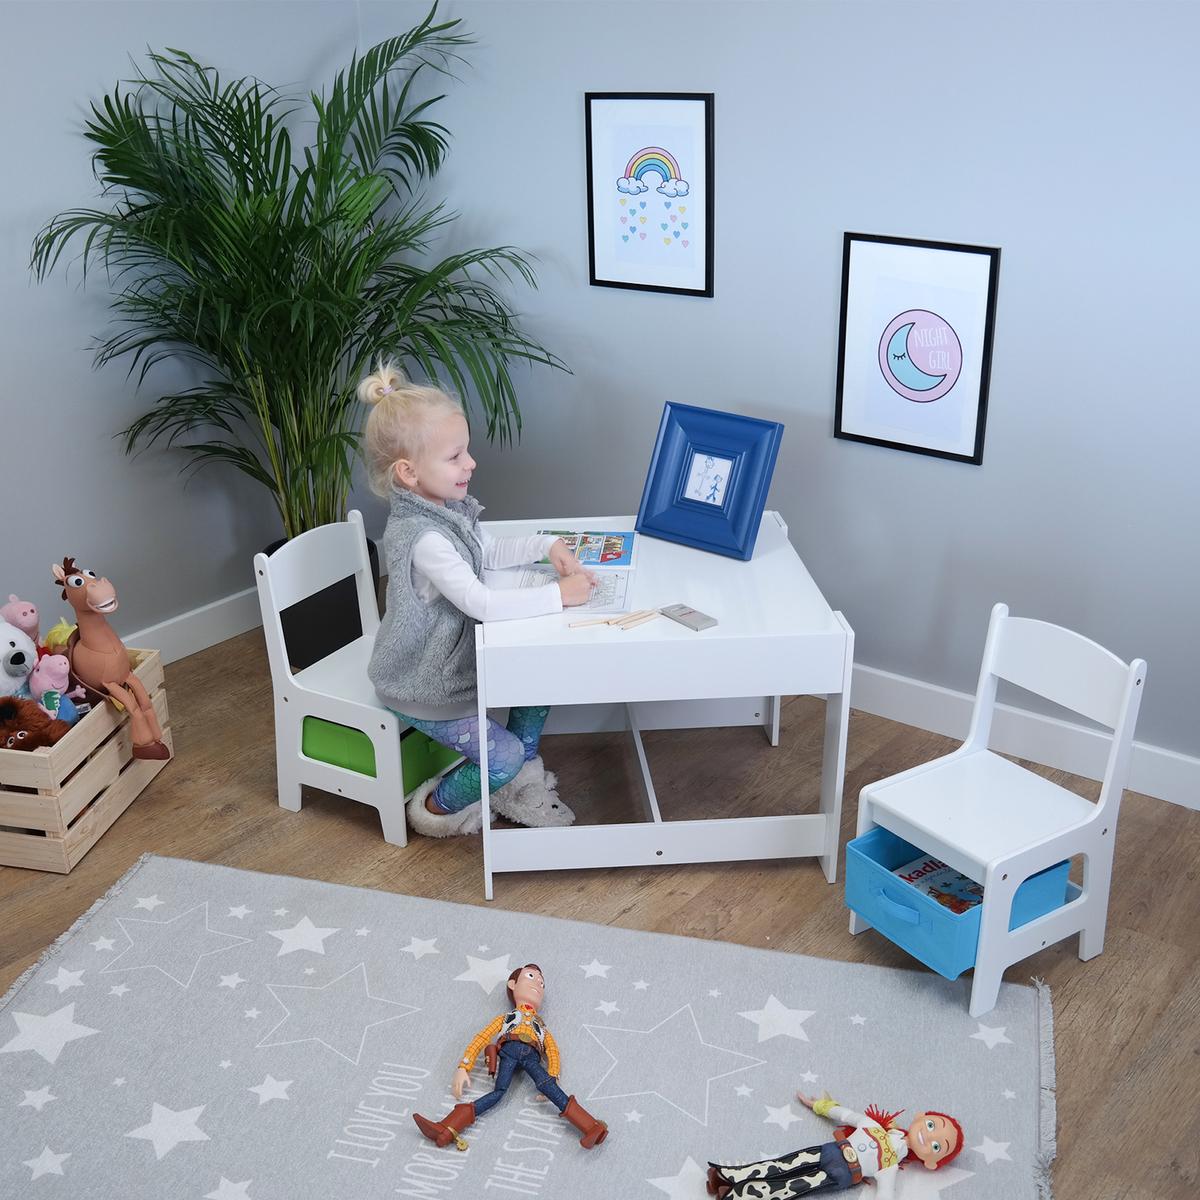 Ourbaby detský stôl so stoličkami s modrým a zeleným boxom